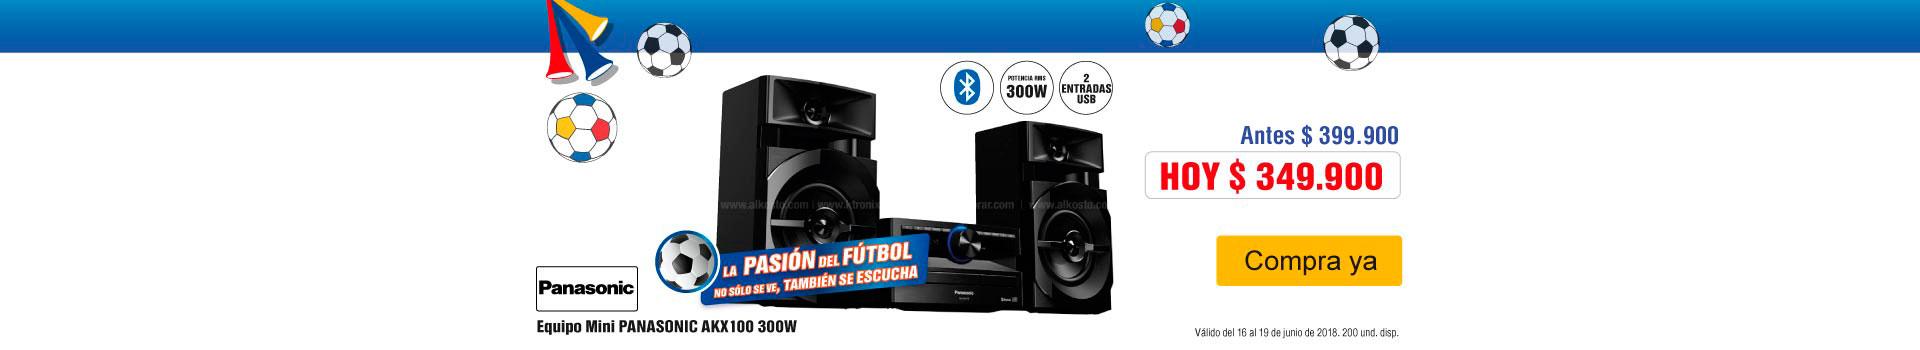 AK-KT-BCAT-5-audio-PP---Panasonic-AKX100-Jun15